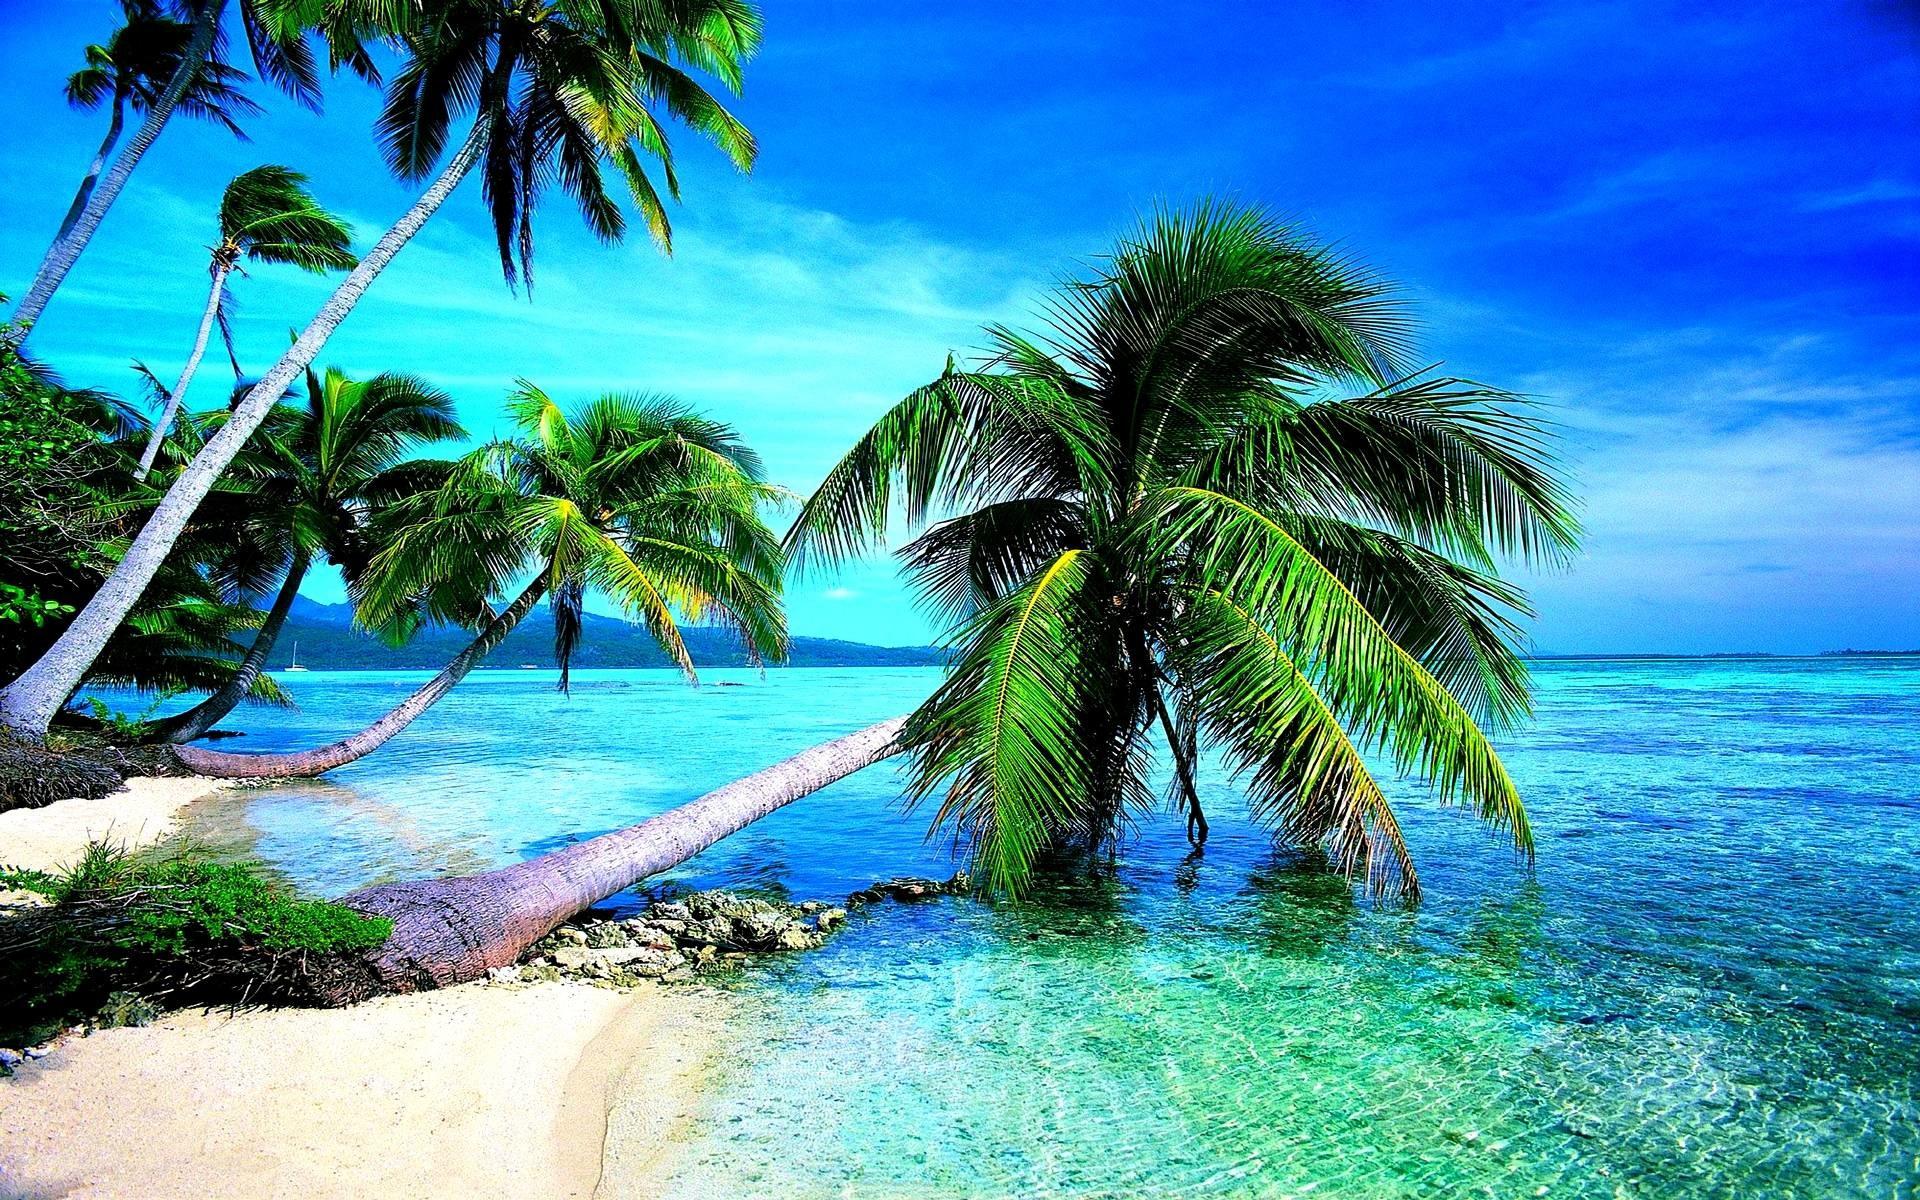 Image – Download-tropical-beach-wallpaper-hd-desktop.jpg .